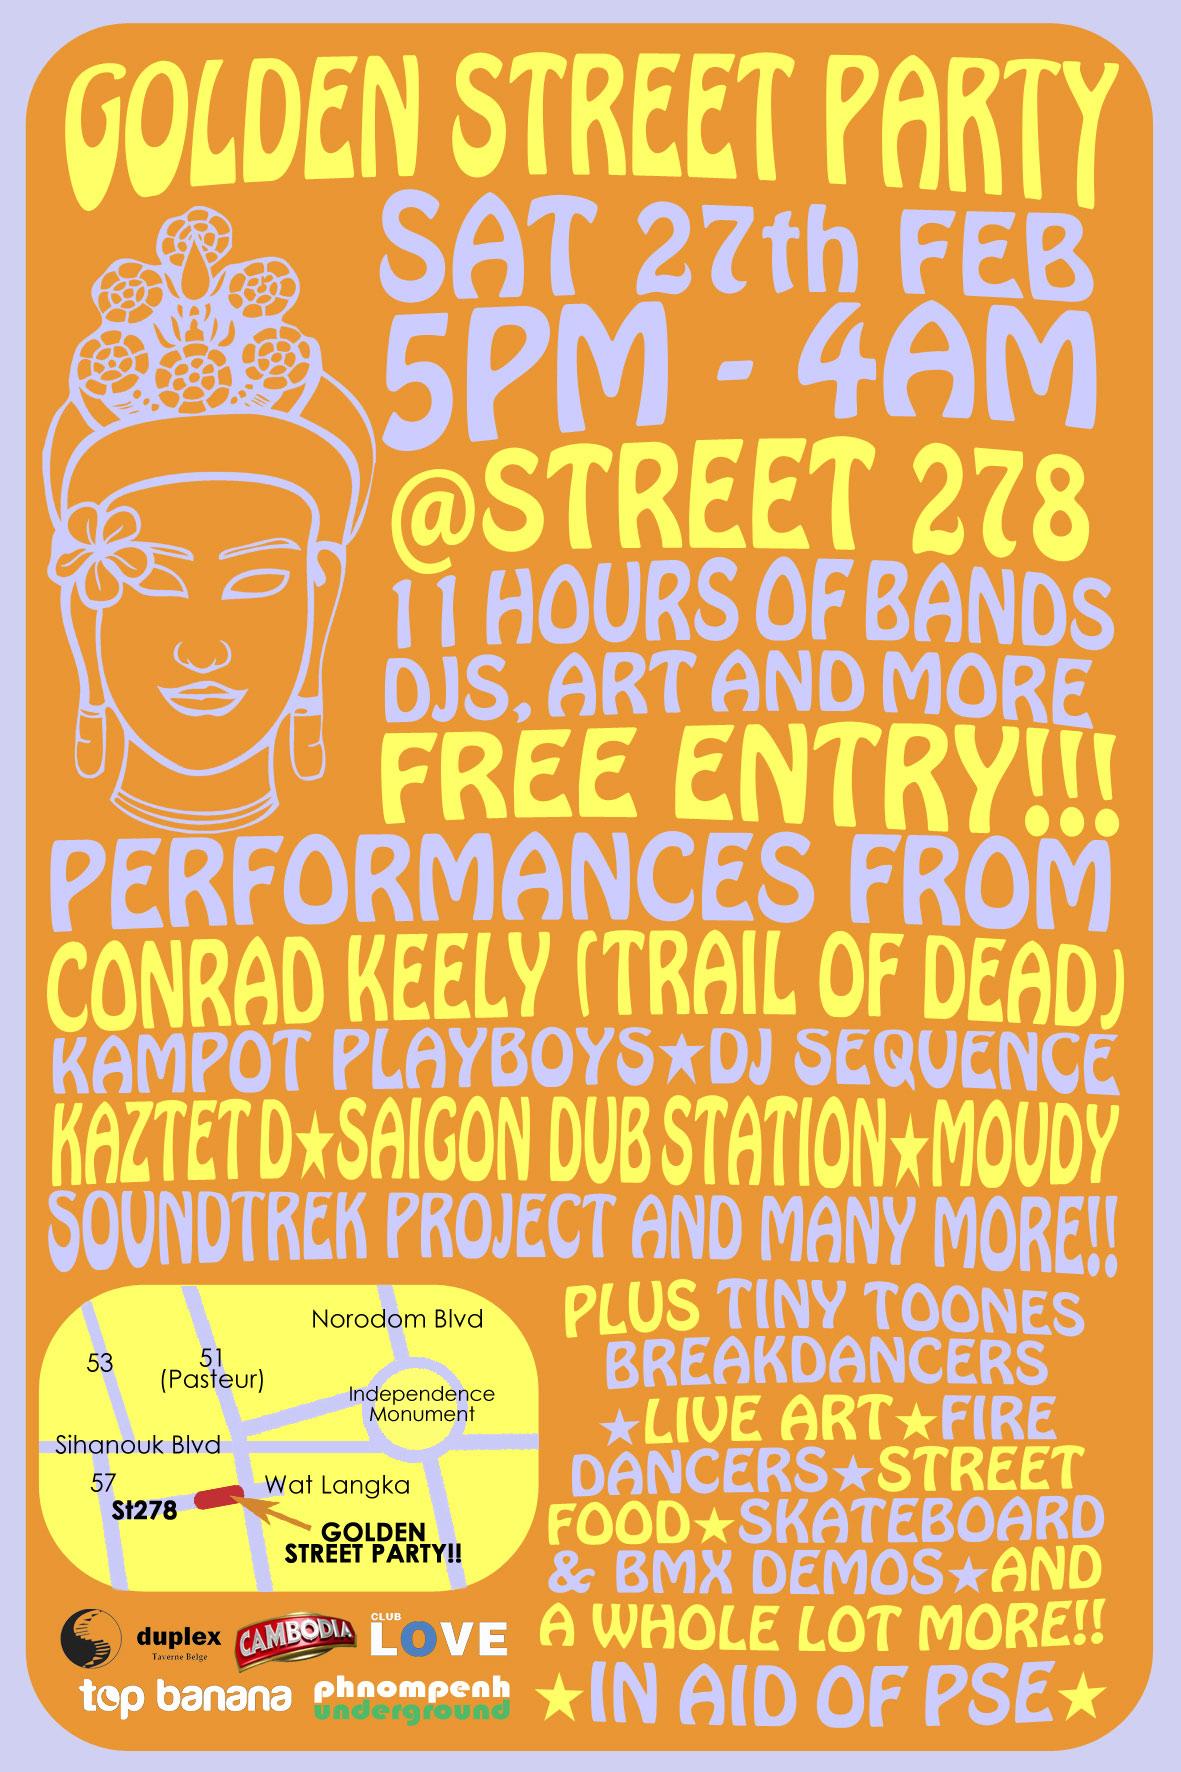 Golden-Street-Party-flyer